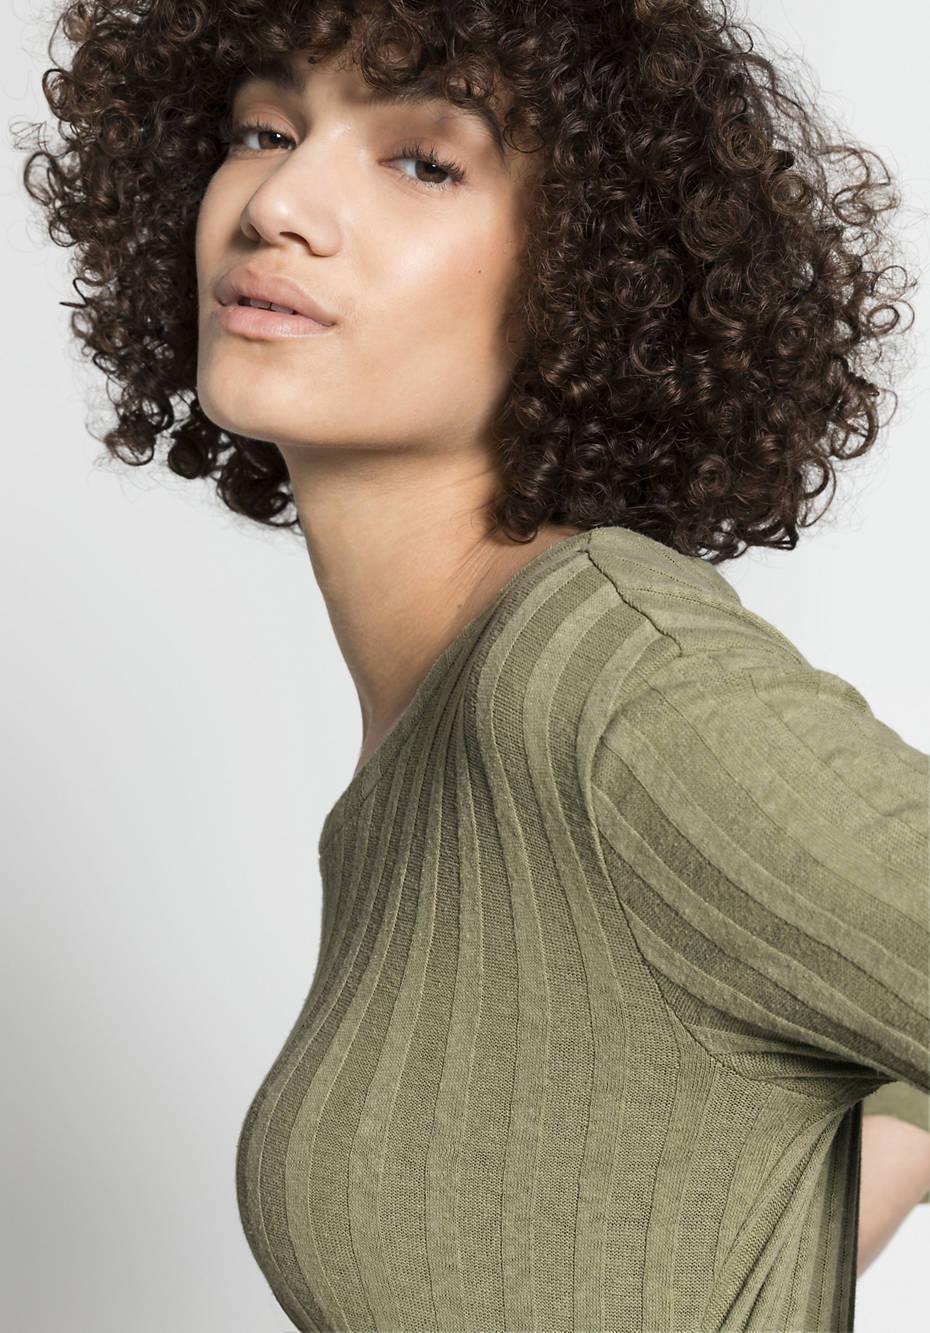 Jersey dress made of organic cotton with hemp